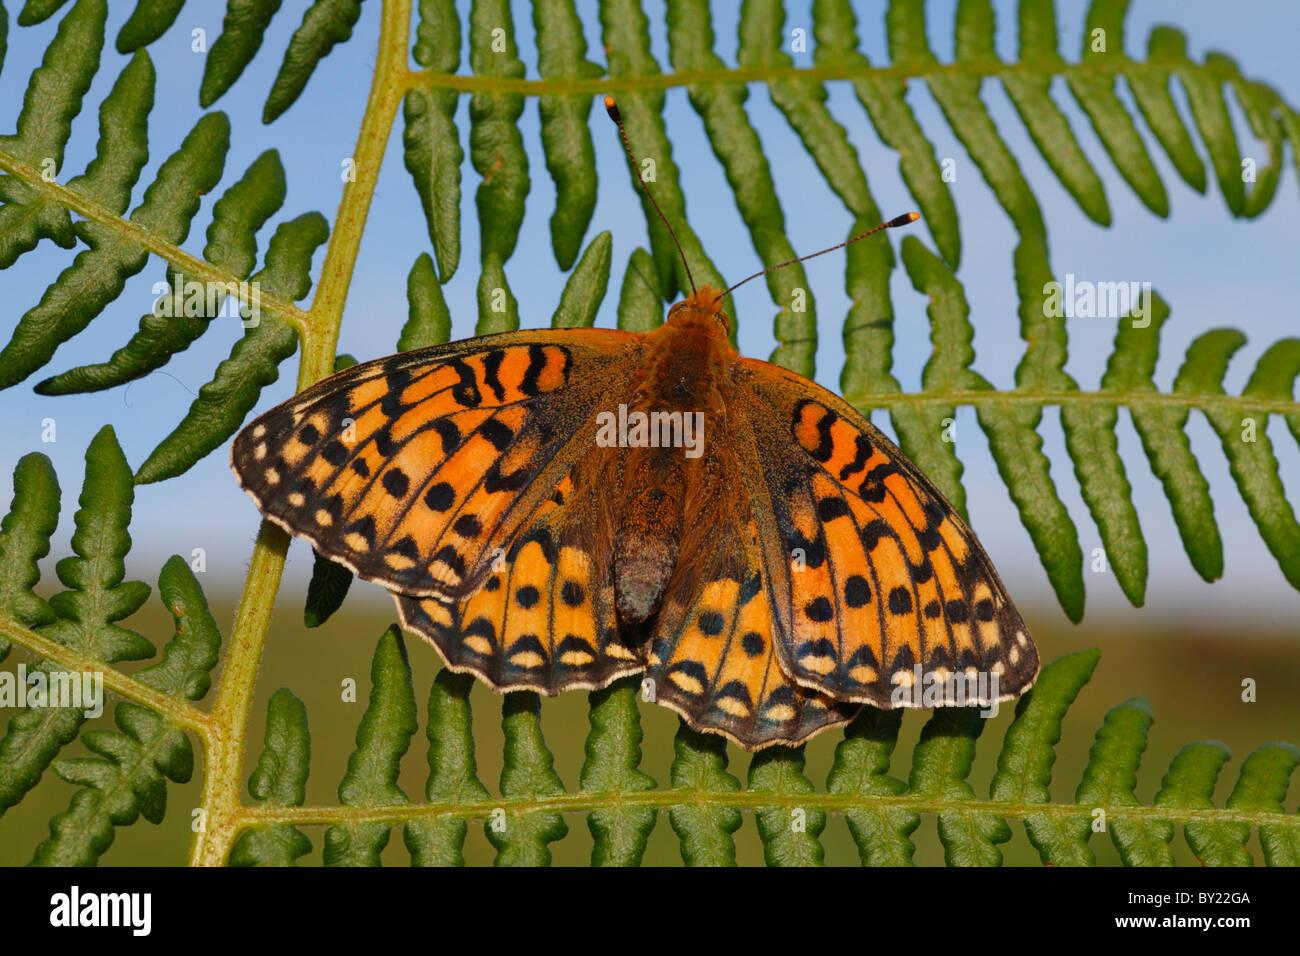 Female Dark Green Fritillary Butterfly (Argynnis aglaja) basking in early morning sunshine. Powys, Wales, UK. - Stock Image